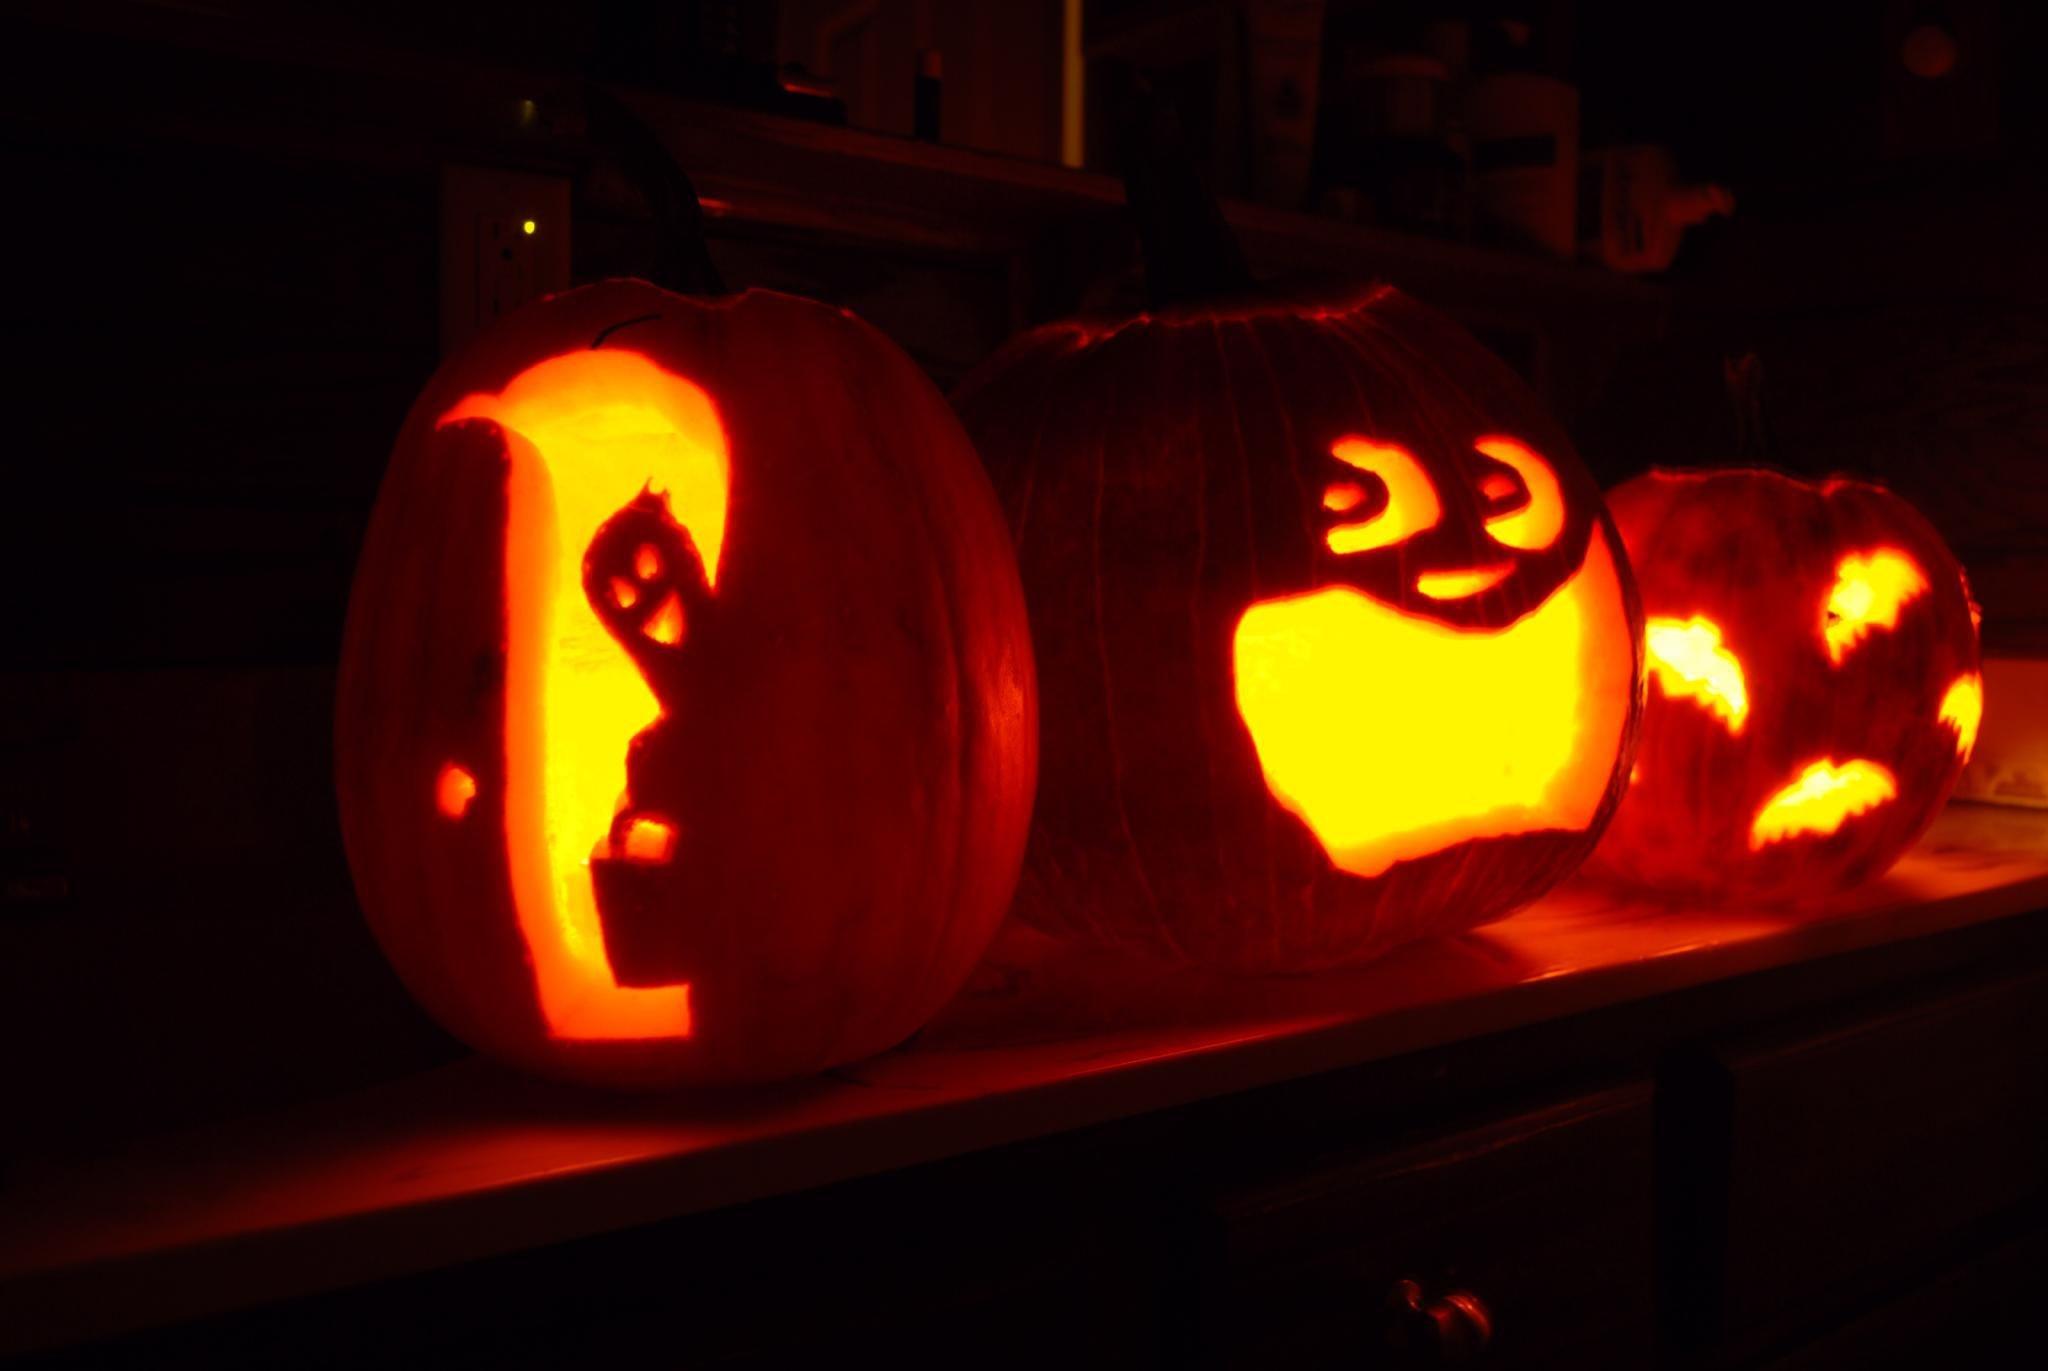 Free Scary Pumpkin Stencils - Scary Pumpkin Stencils Free Printable